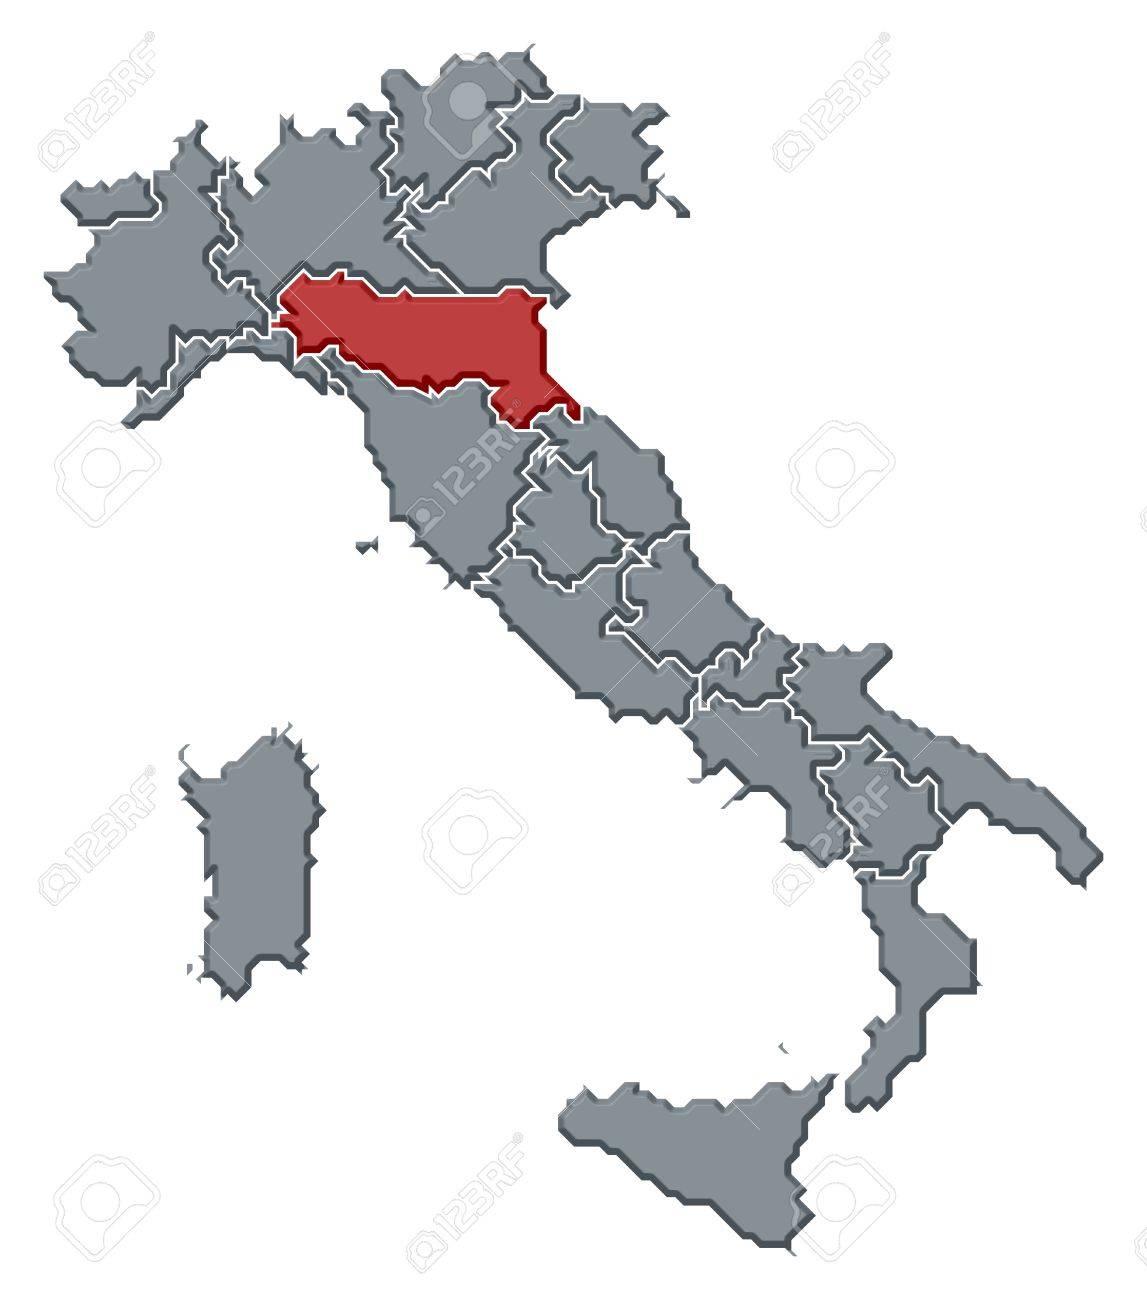 Cartina Italia Emilia Romagna.Mappa Politica D Italia Con Varie Regioni In Cui E Evidenziata Emilia Romagna